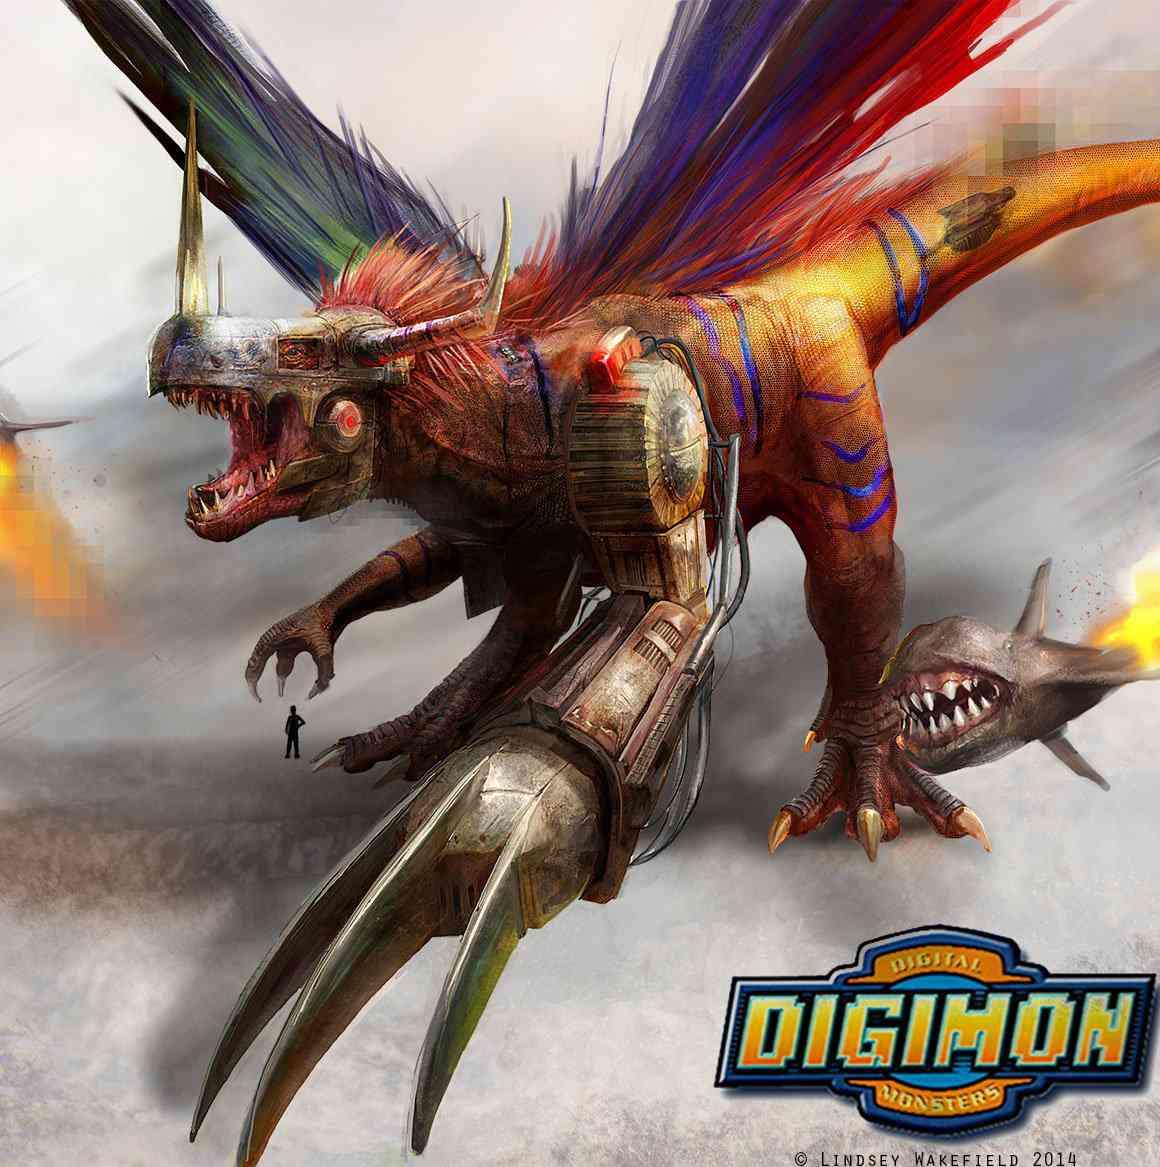 digimon  metalgreymon by twodd d71a6lk Ultra gump blaster mega pack ultimate post de monstros 4